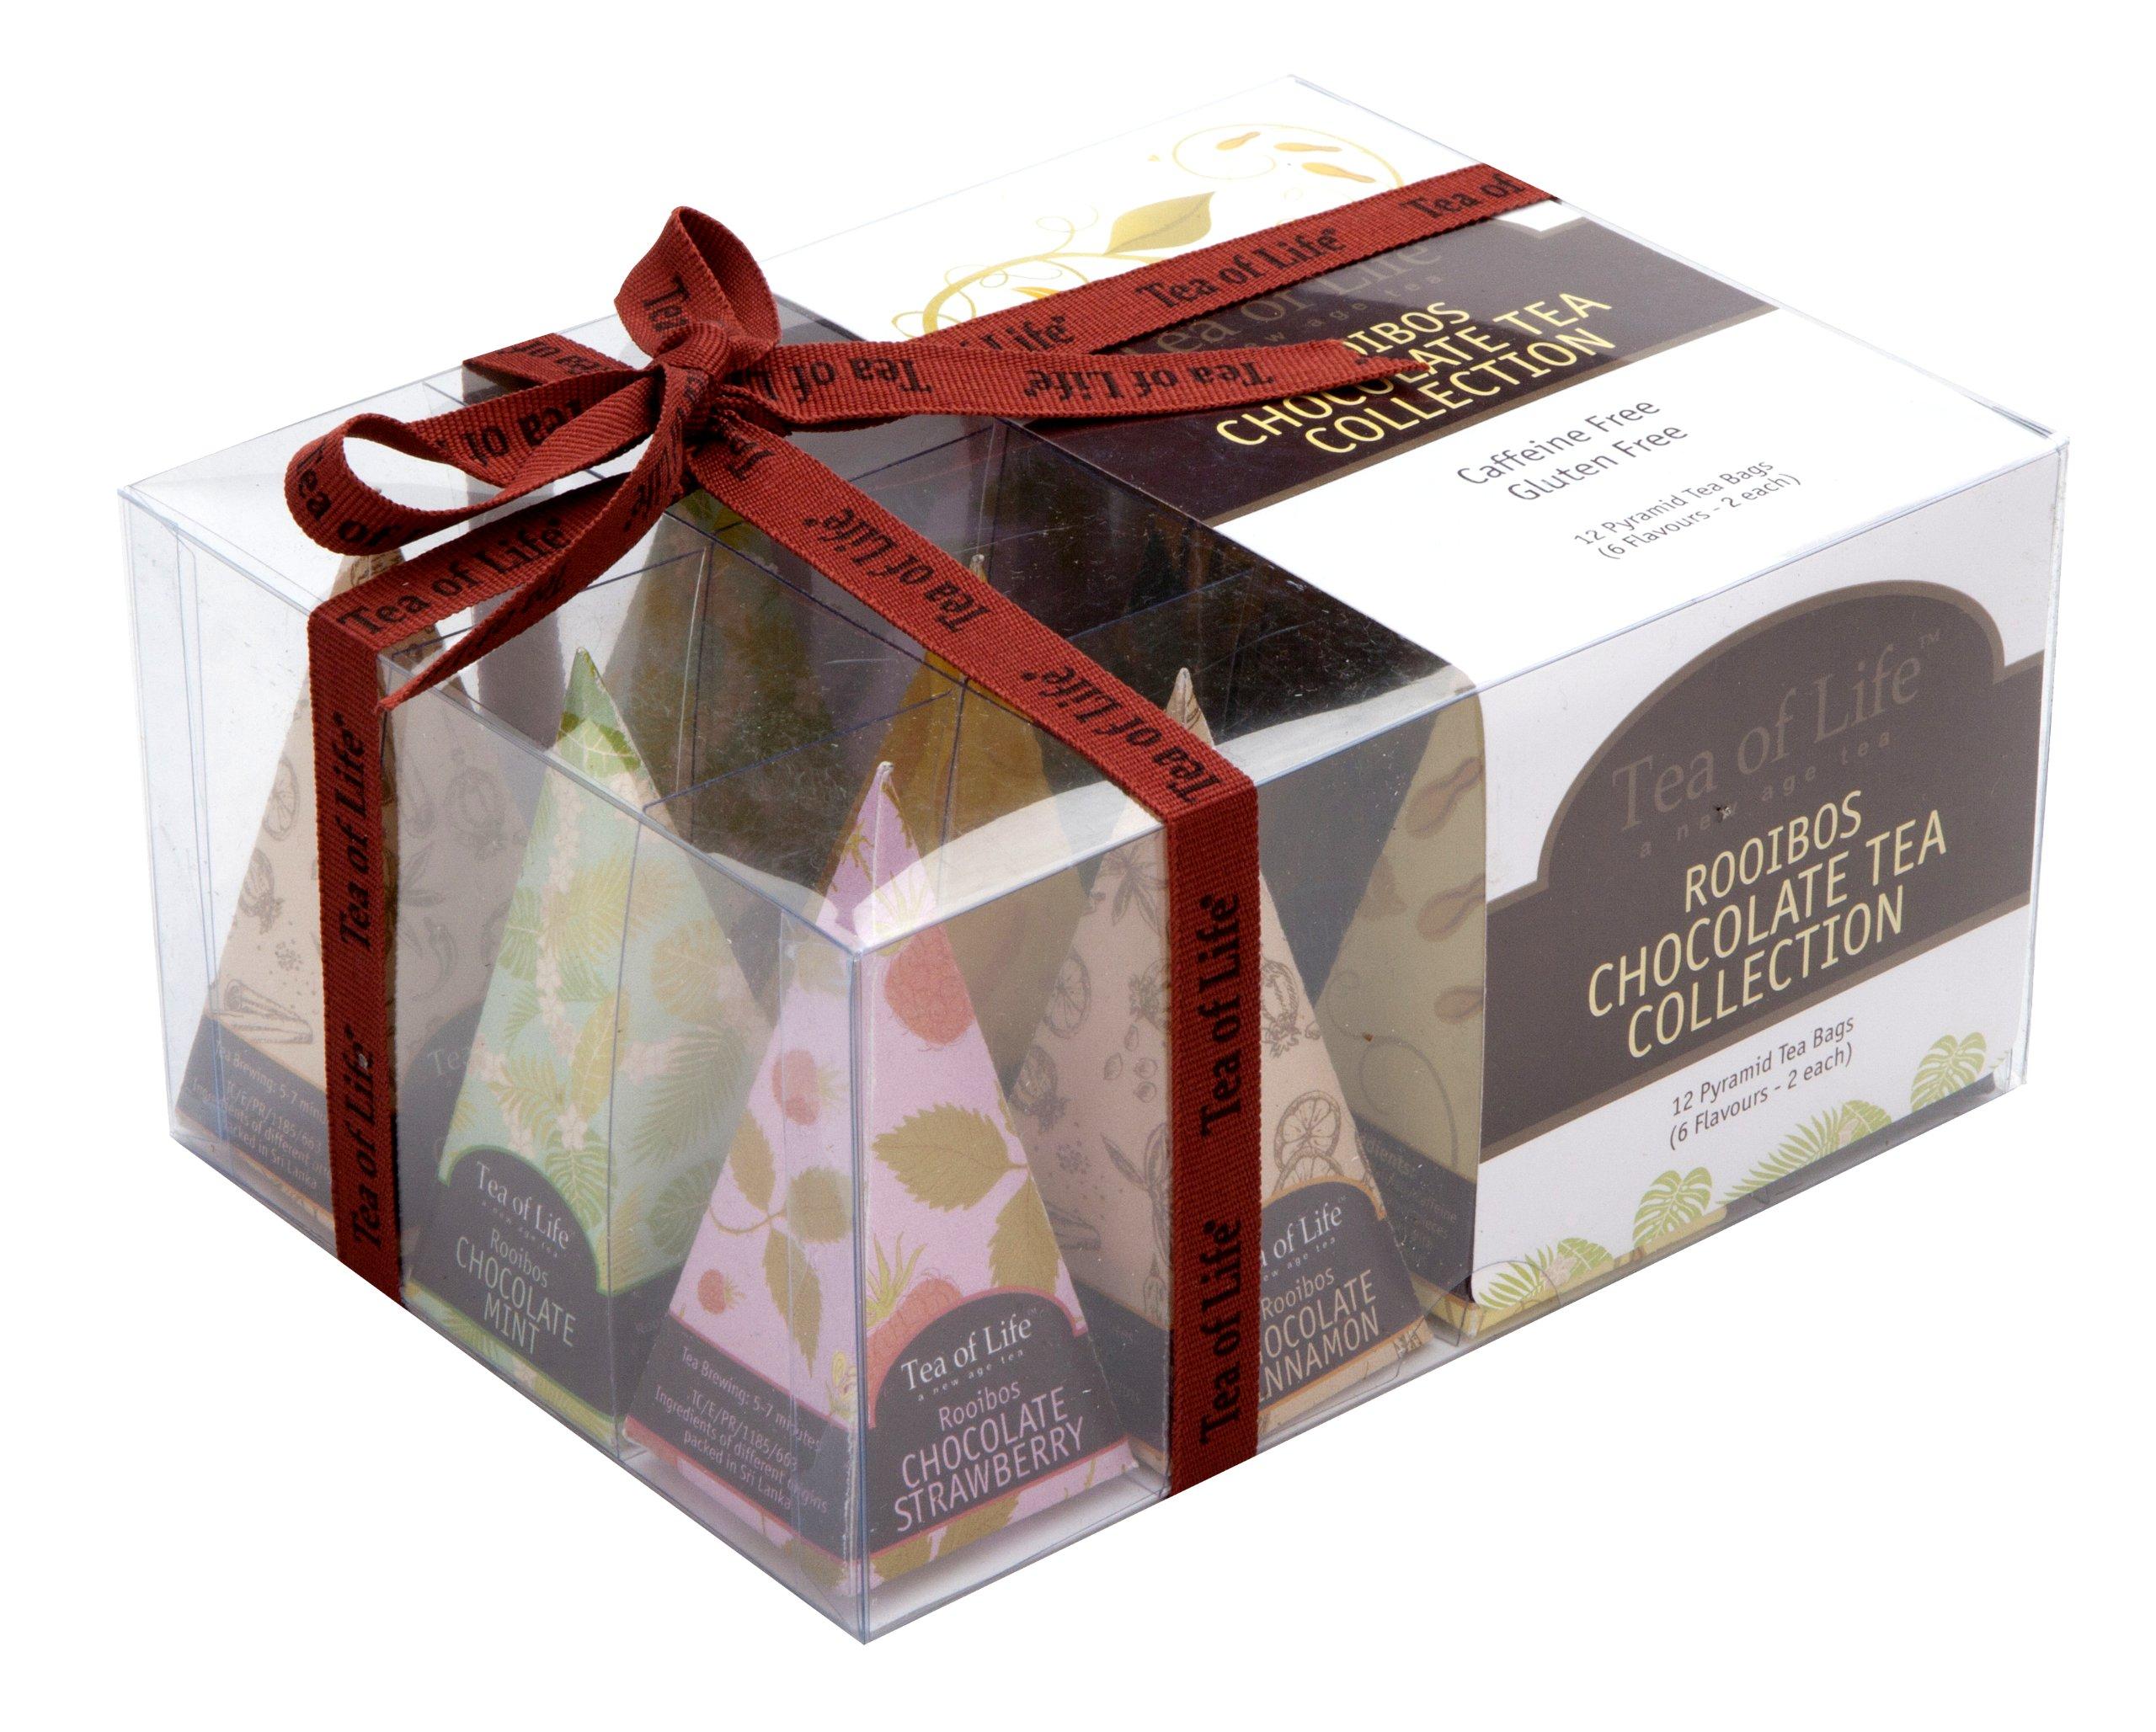 Tea of Life Tea Collection, Rooibos Chocolate, 12 count, 0.85 Ounce